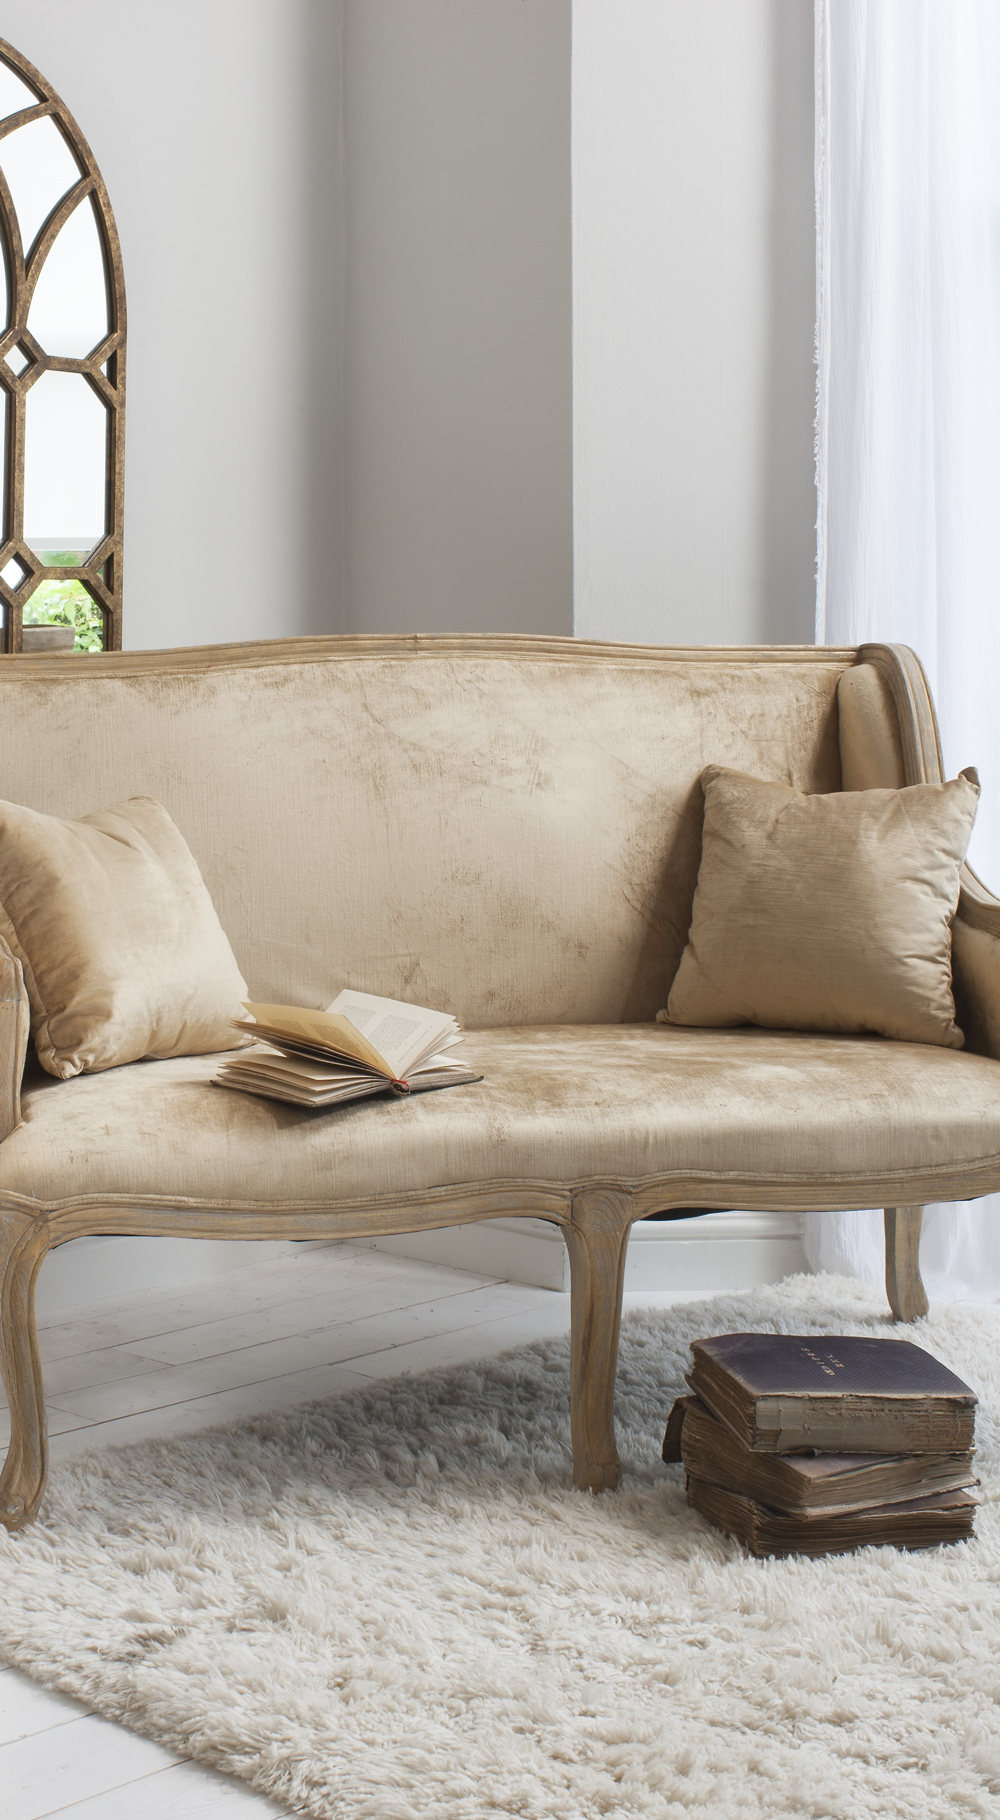 Amazing Beck 3 Seater Clic Clac Sofa Bed Luxury Sofa Sofa Buy Creativecarmelina Interior Chair Design Creativecarmelinacom